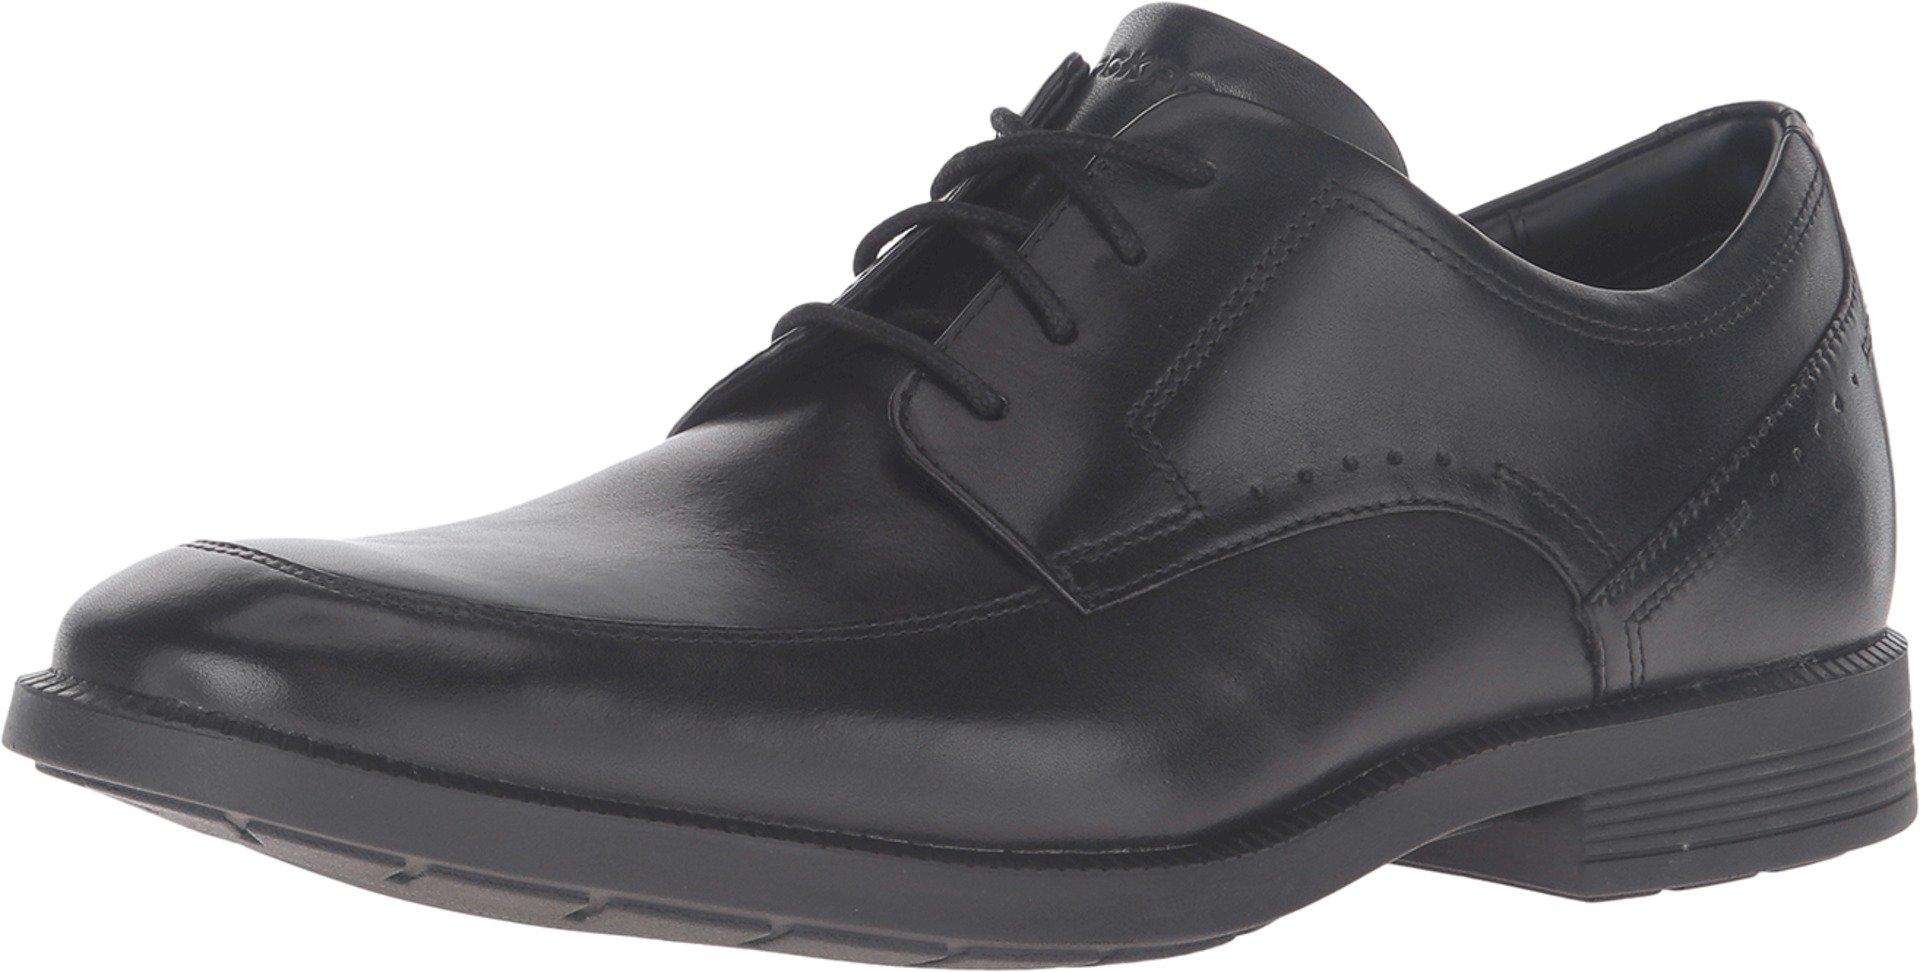 Rockport Men's Dressports Business Apron Toe Shoe, Black, 9 M US